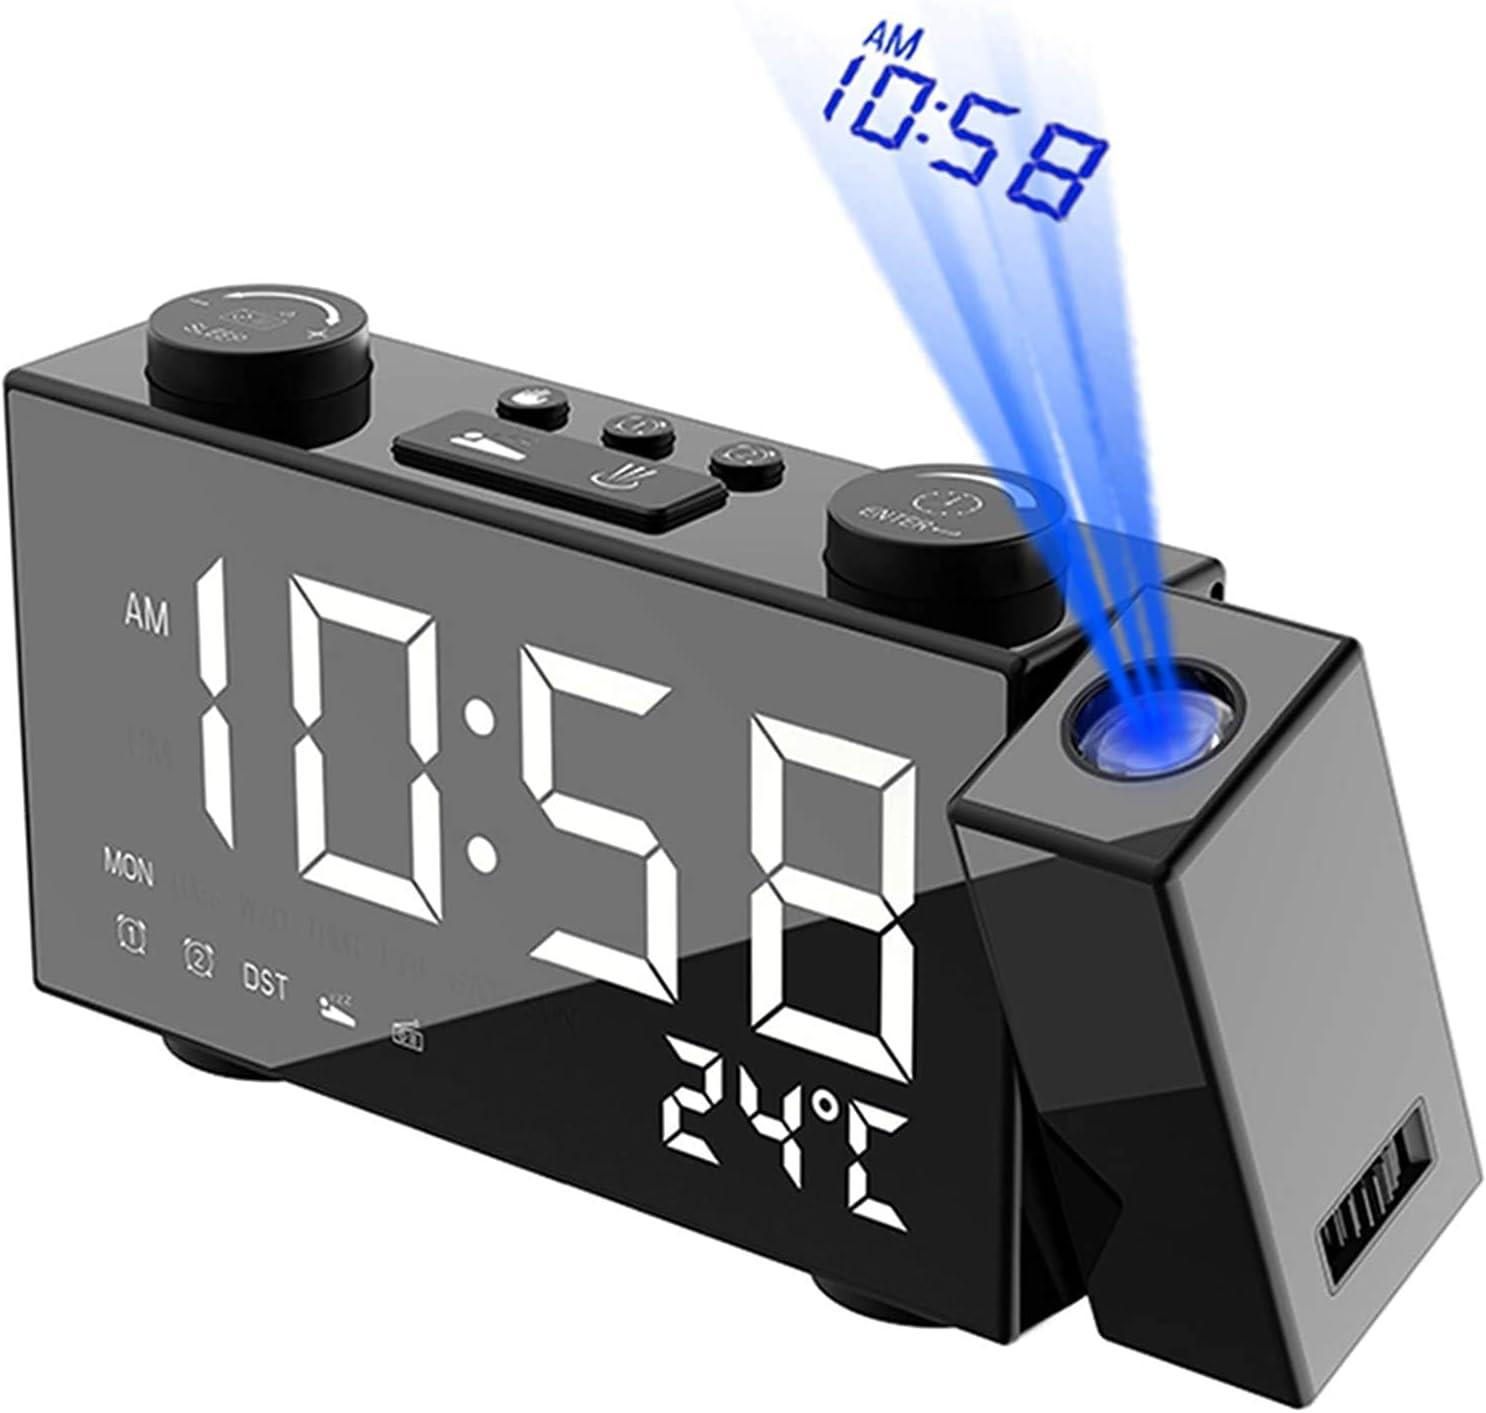 Llpeng Surprise price LED Alarm Clock Date Max 51% OFF Function Digital Dual